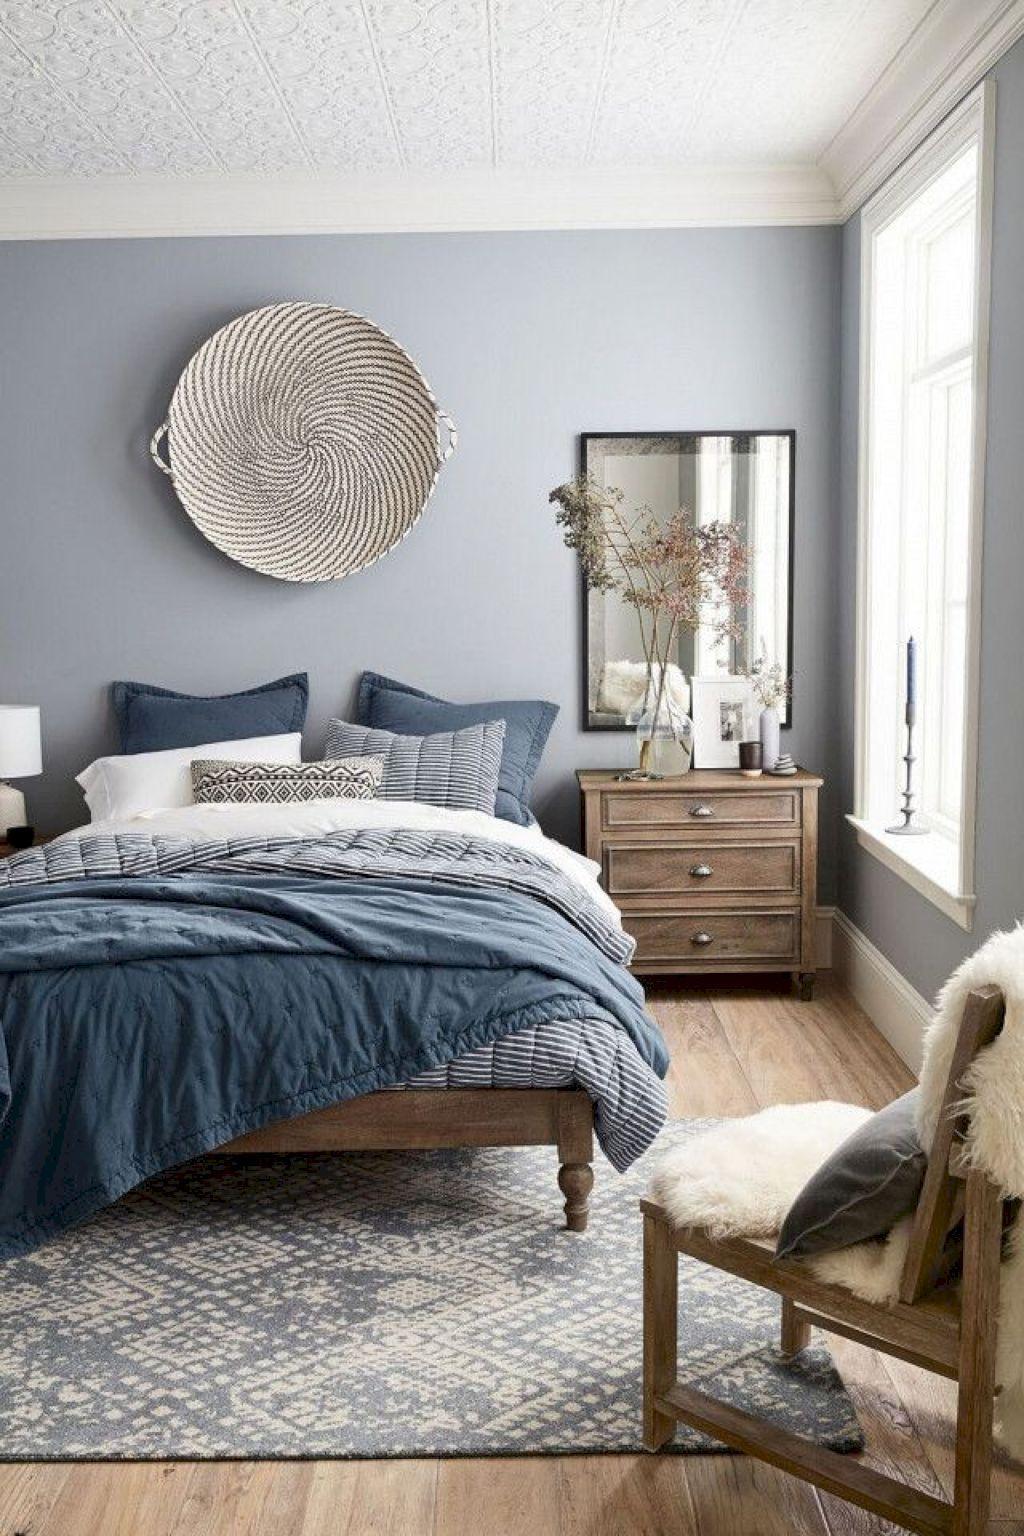 comfy boho style bedroom decor and design ideas cozy apartment